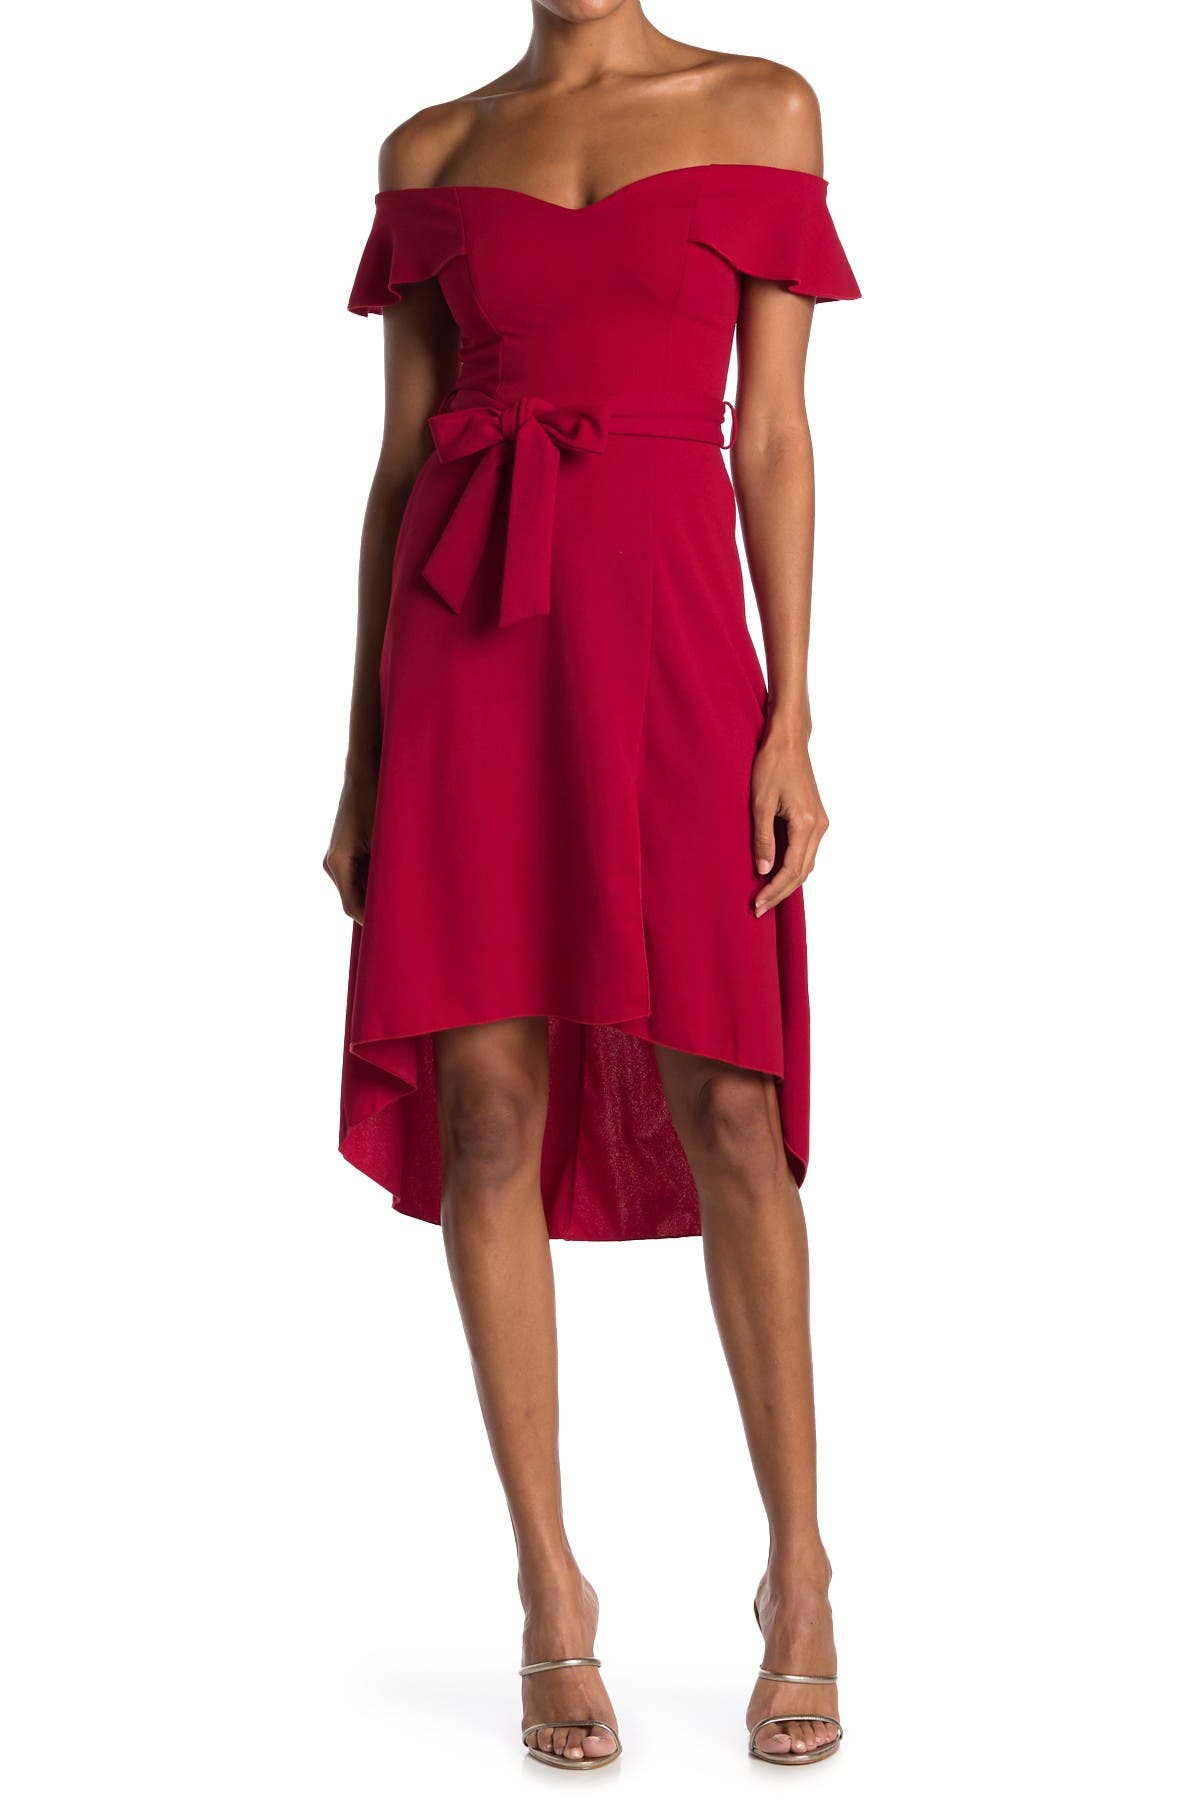 Image of Love, Nickie Lew Off-the-Shoulder High/Low Ruffle Hem Midi Dress